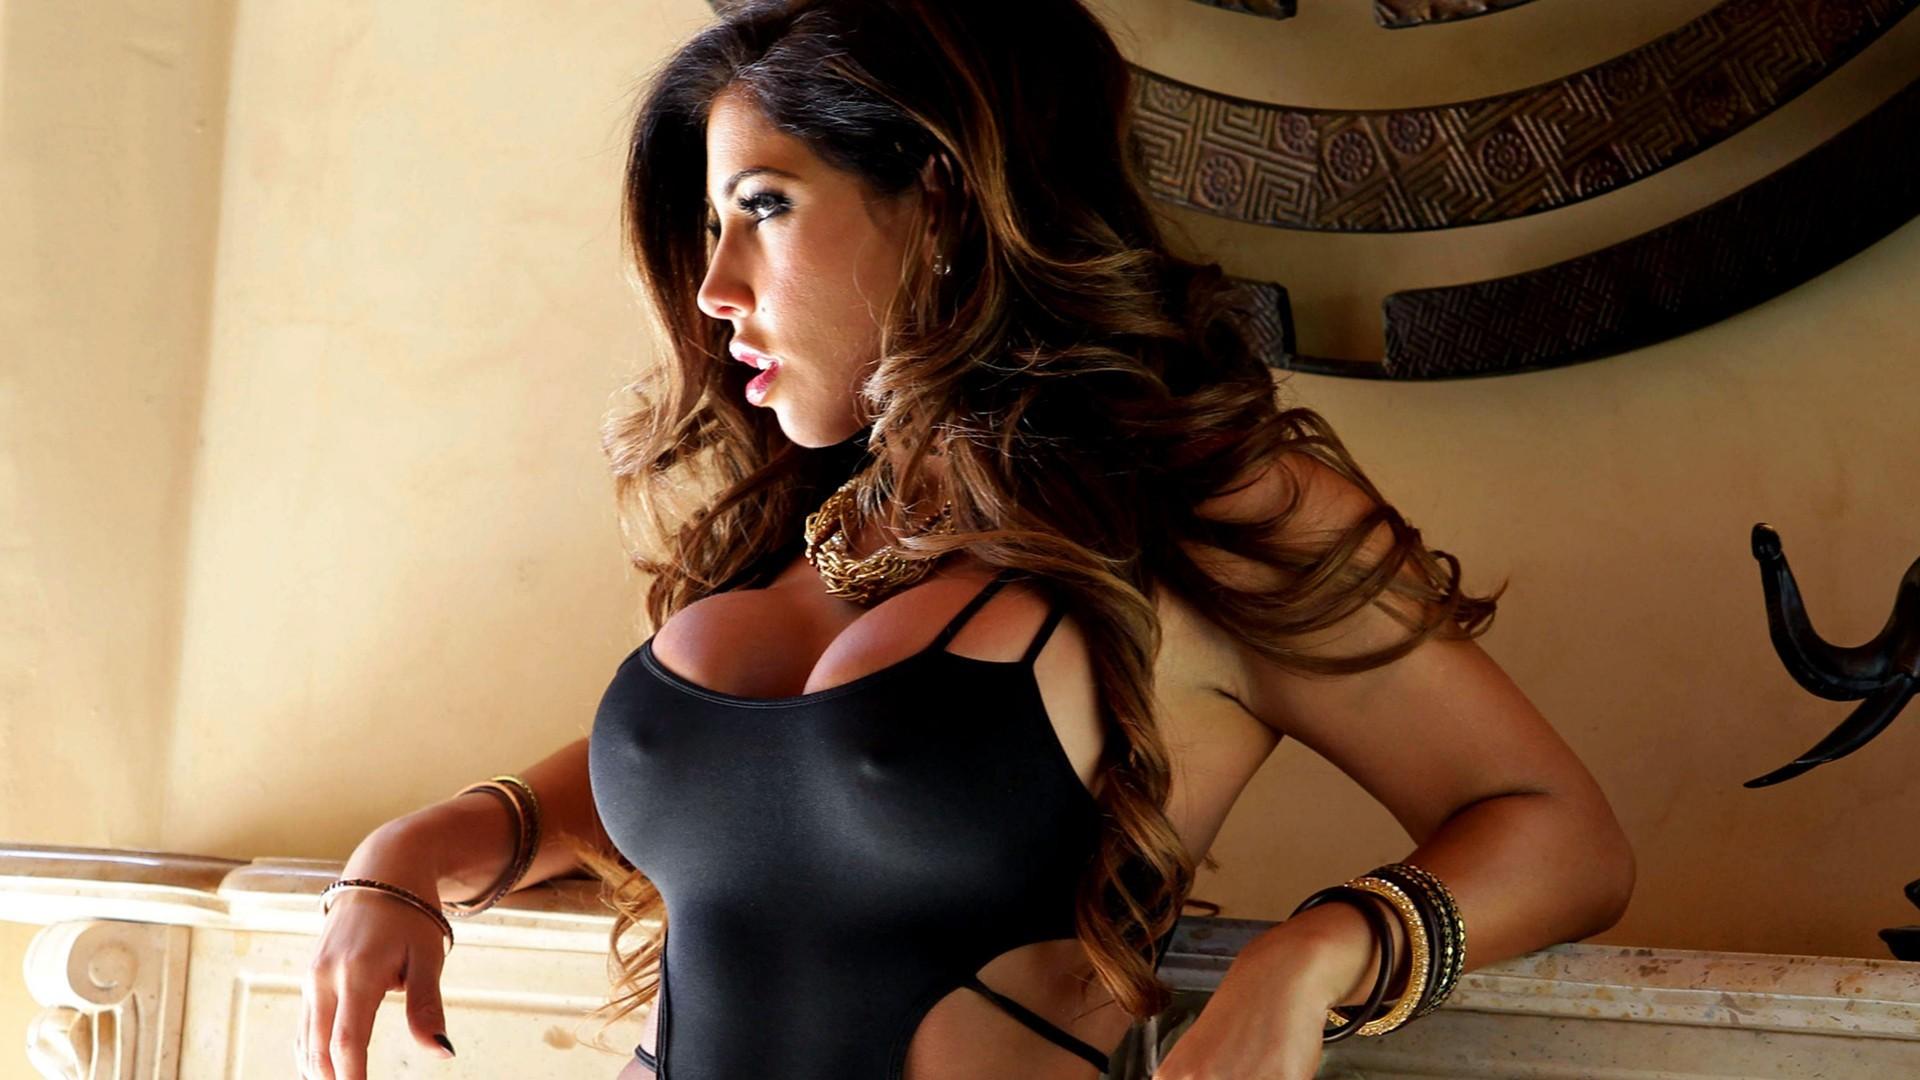 women model big boobs bracelets black hair lingerie nipples through  clothing clothing Carmen Ortega leg muscle